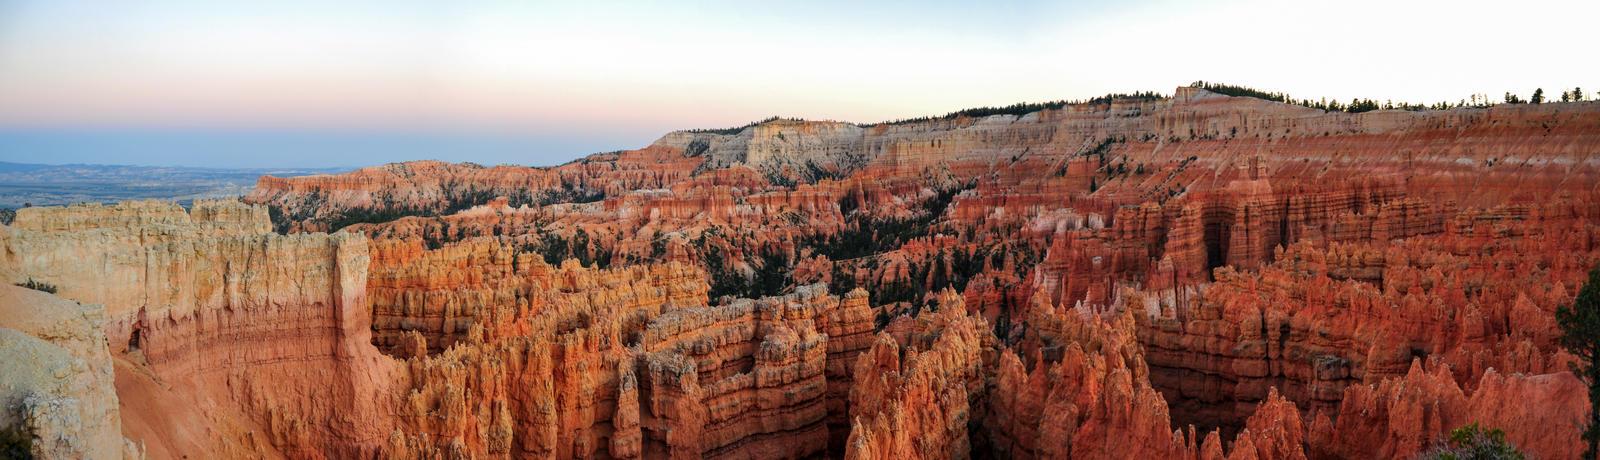 Bryce Canyon Panorama by NorthOne